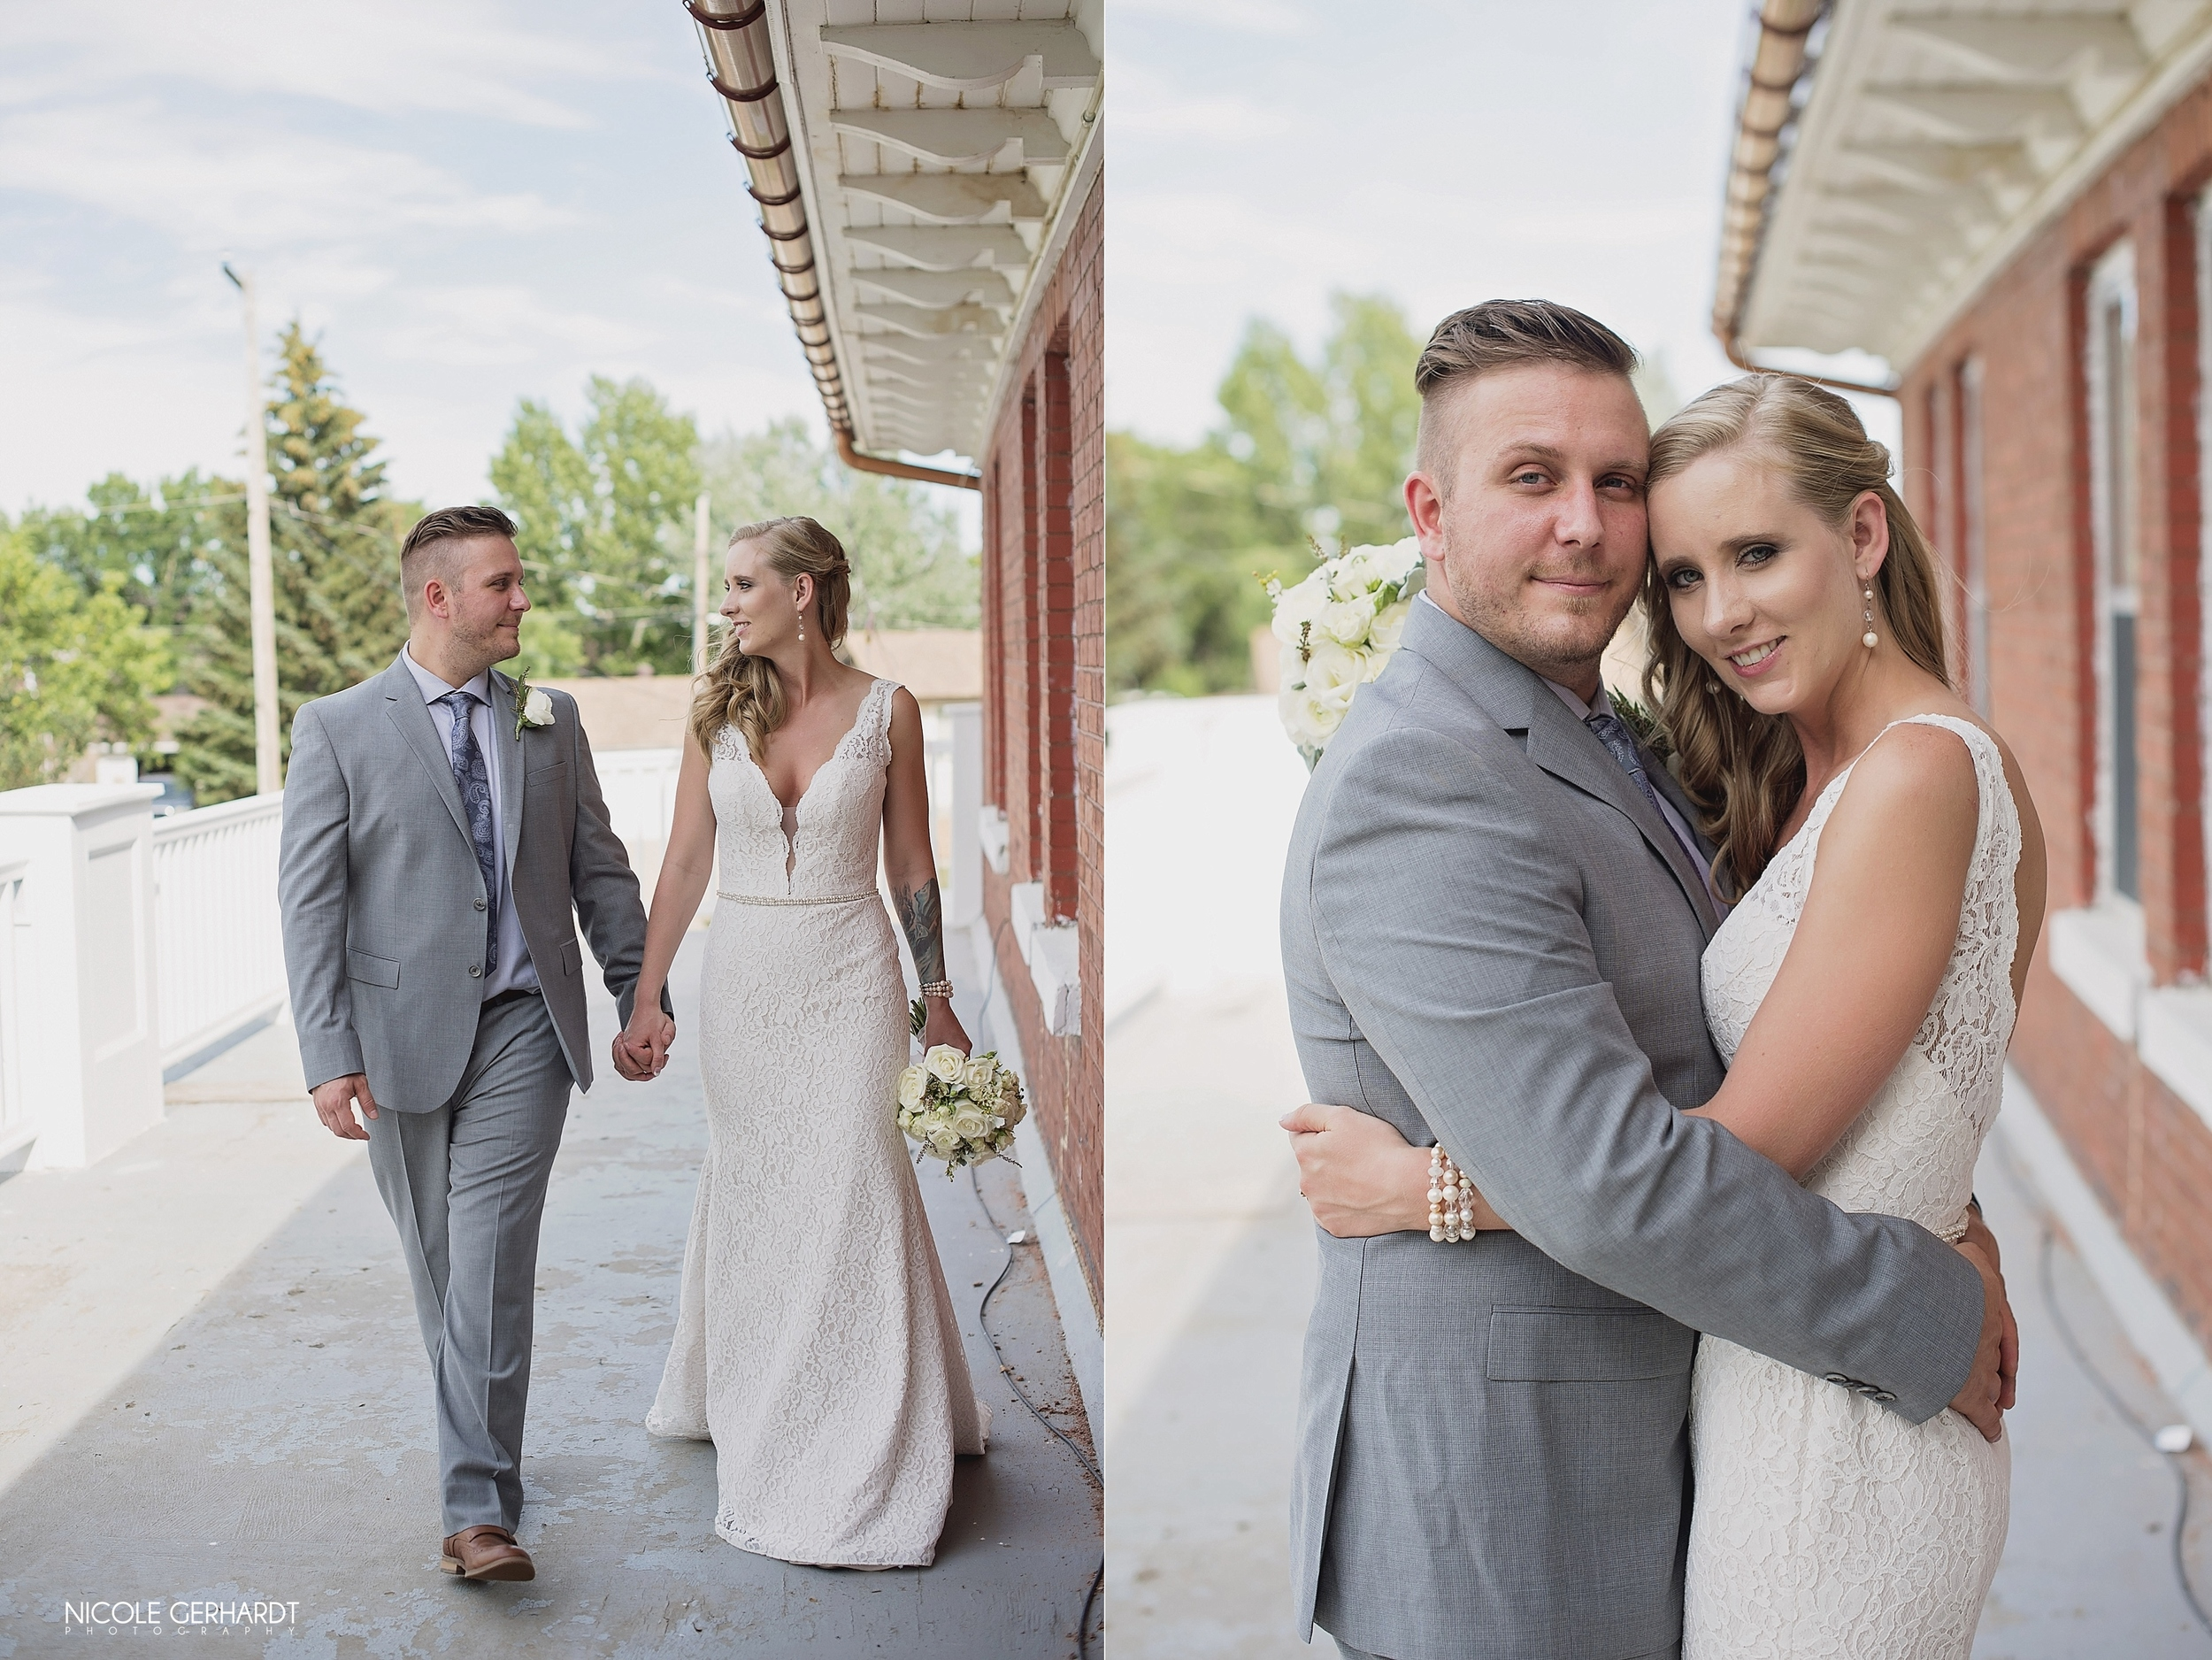 regina_wedding_moosejaw_photographer23.jpg